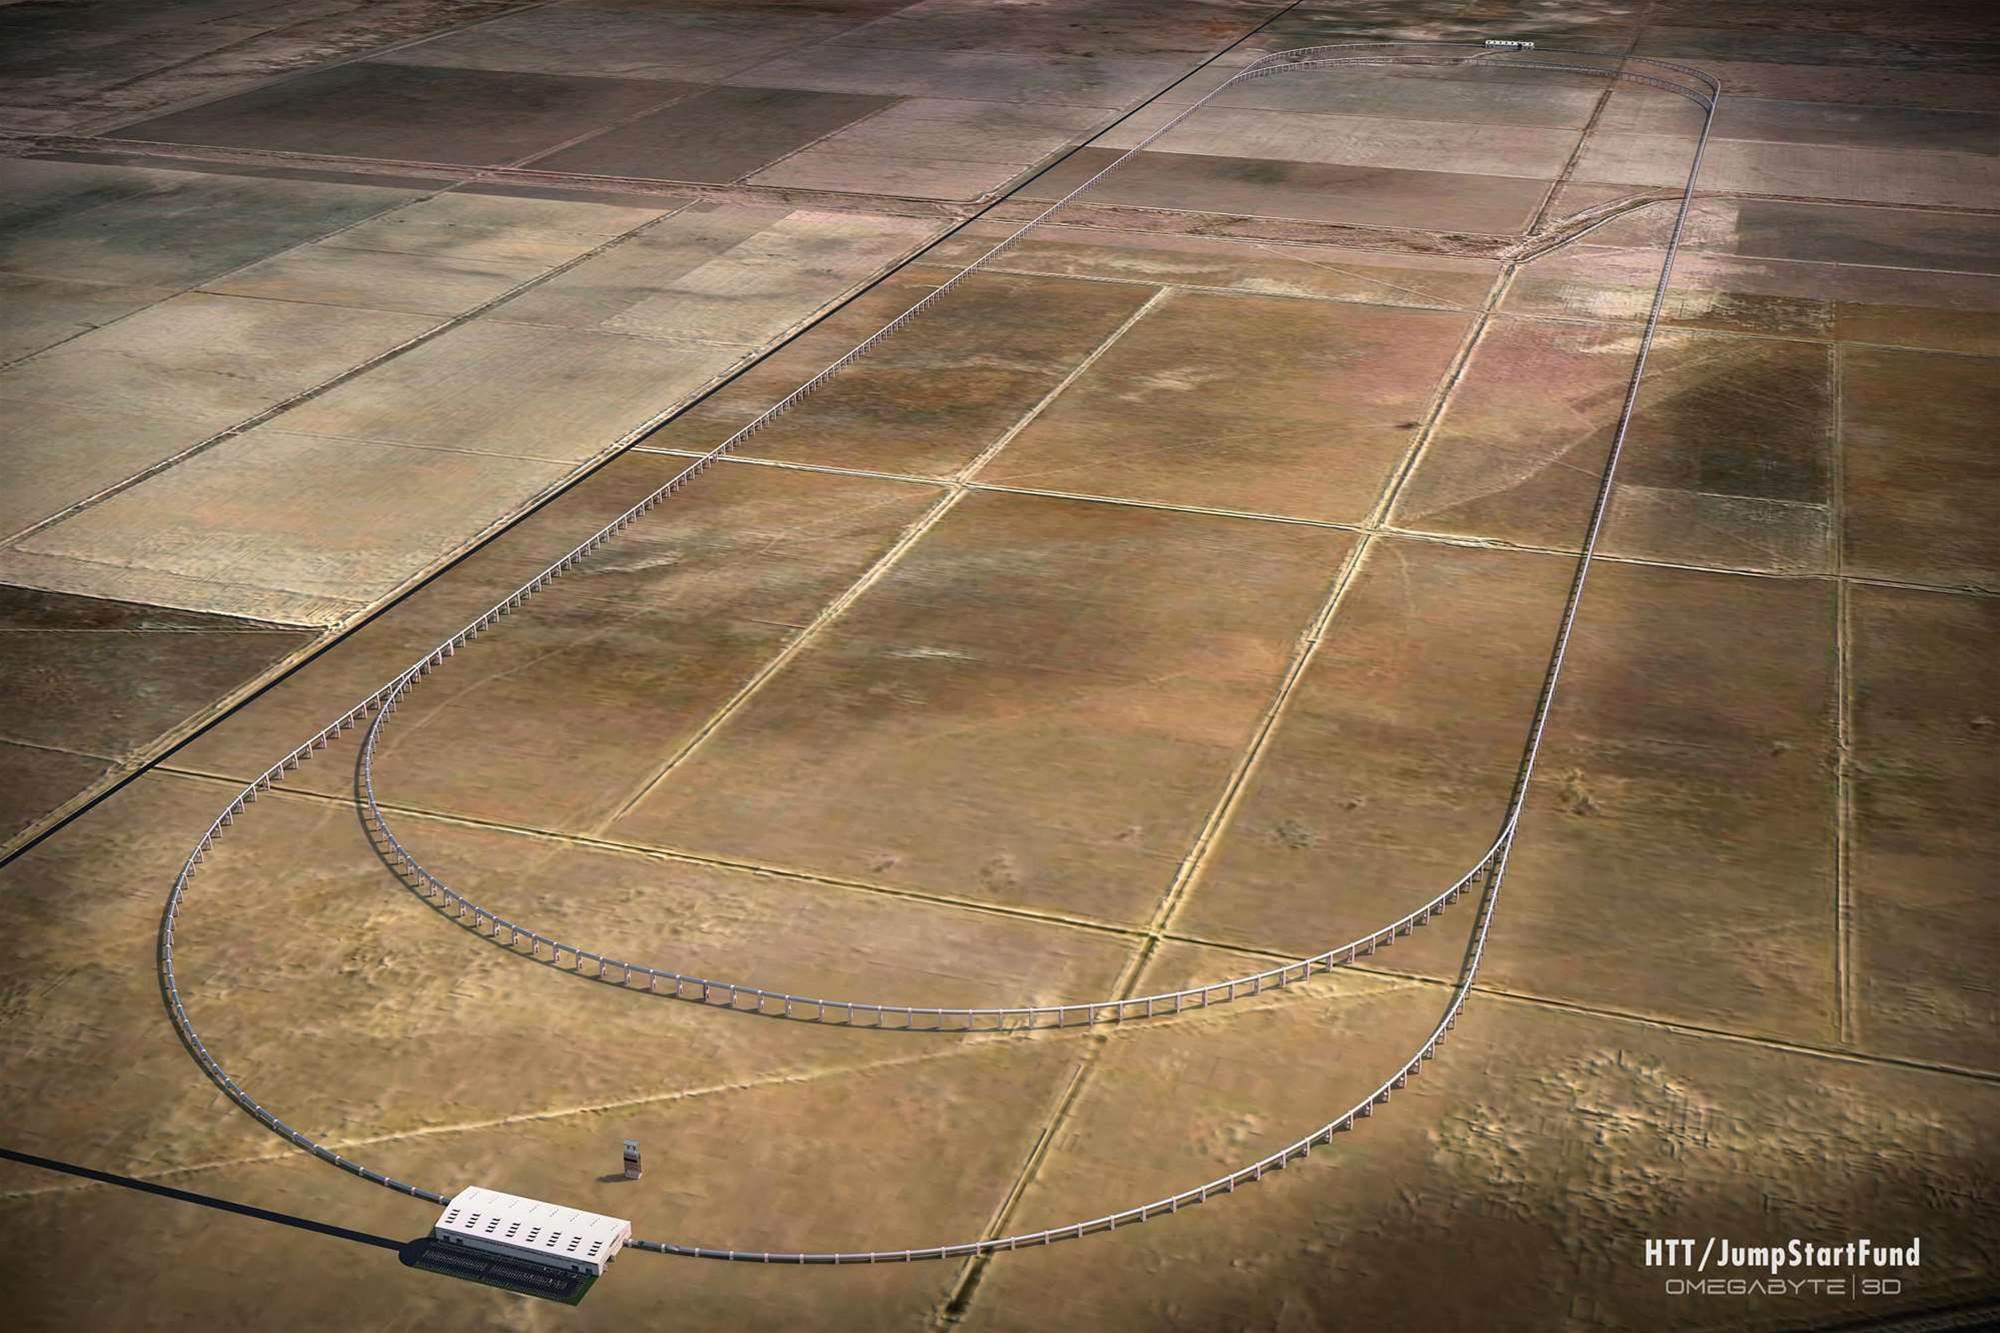 California Hyperloop Test Track Will Start Construction Soon